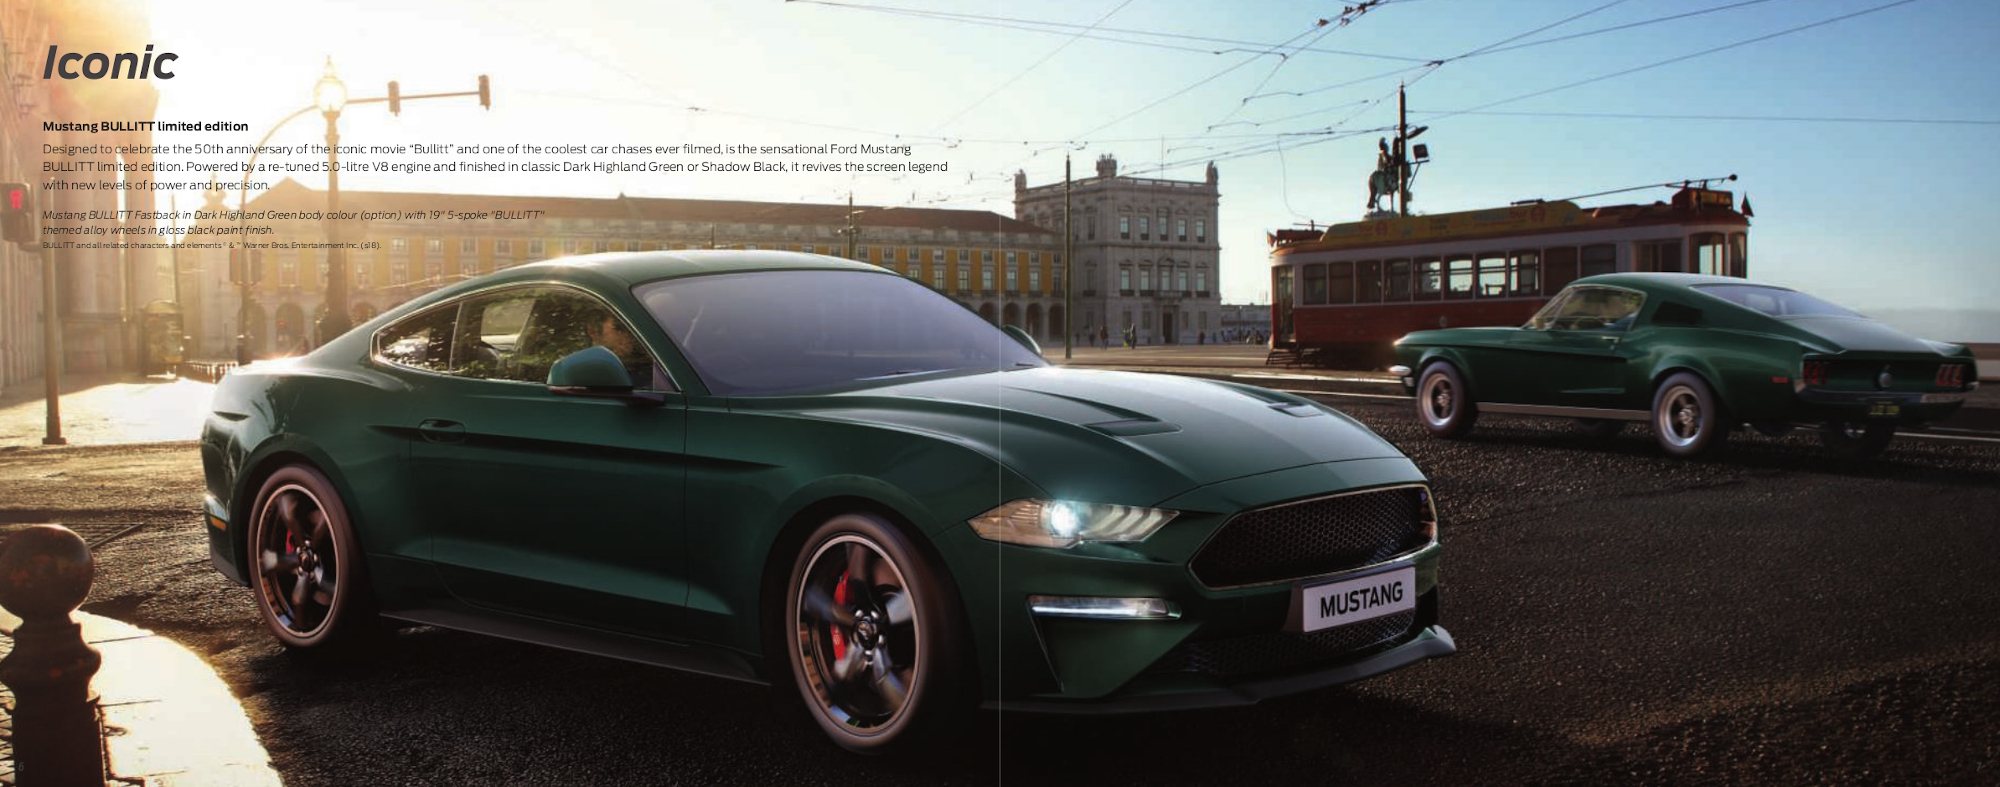 2020 Ford Mustang Bullitt Specs